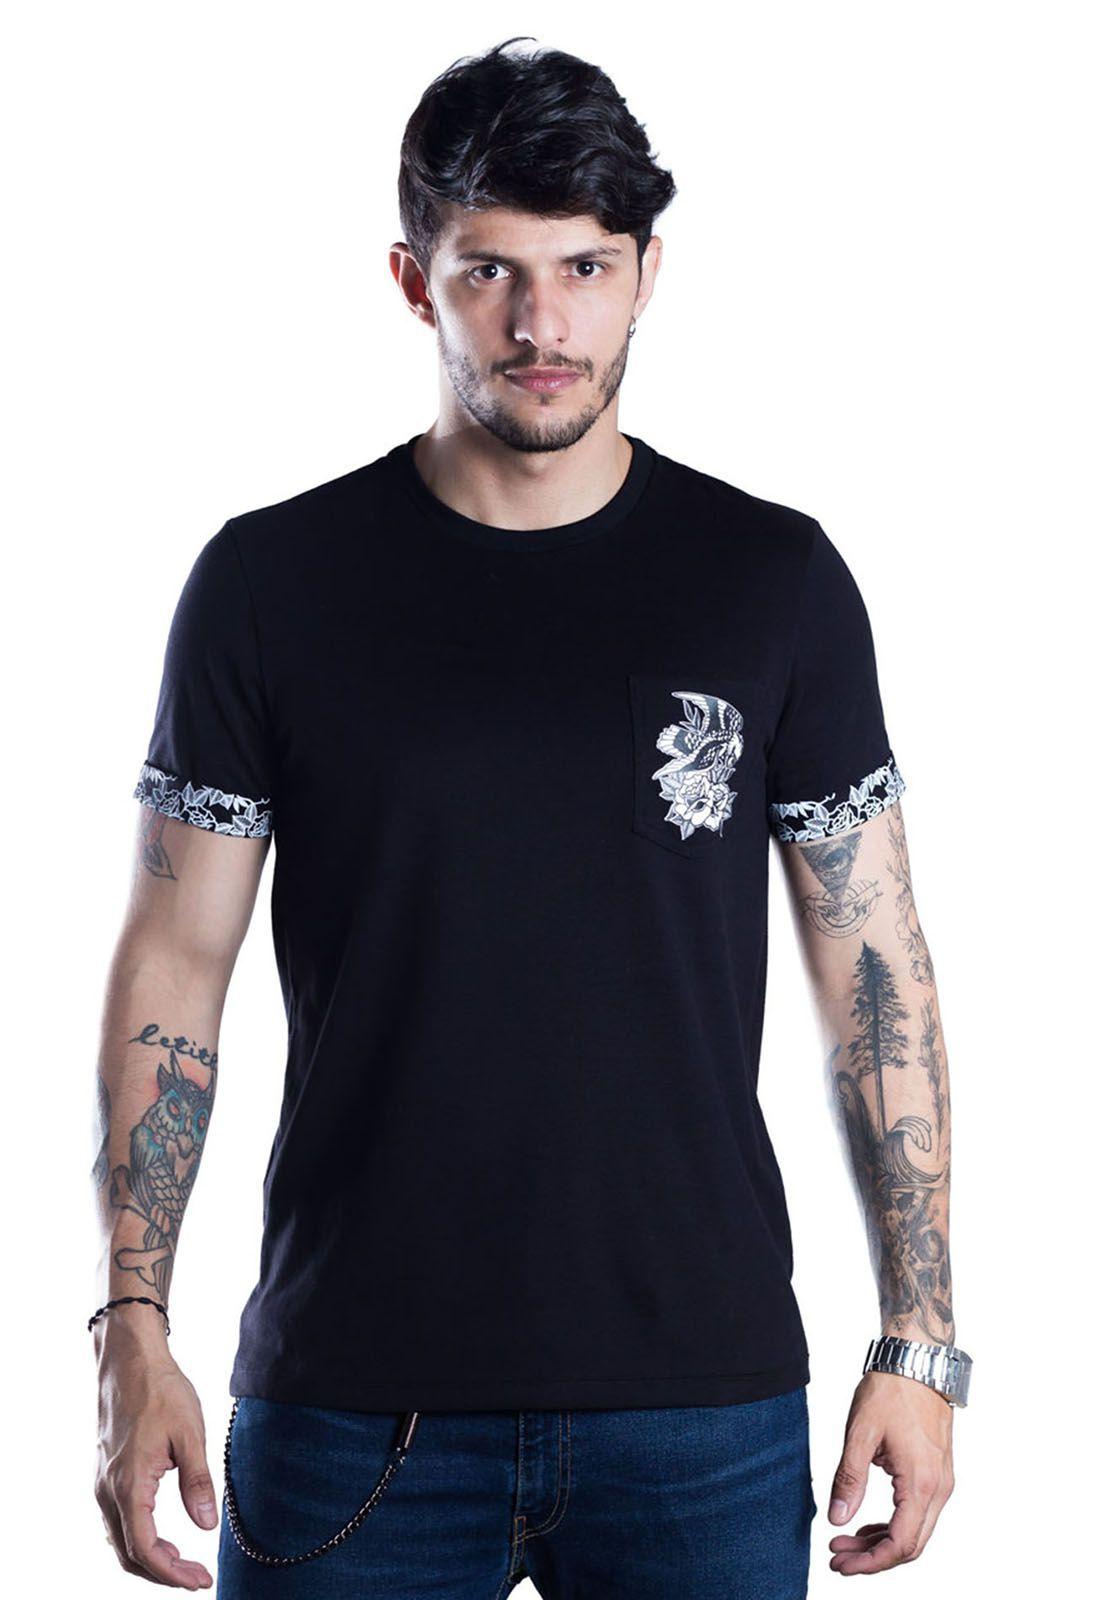 camisetas   masculinas   caráter   vistacarater   comprar camisetas ... 7cbcdd9deeb